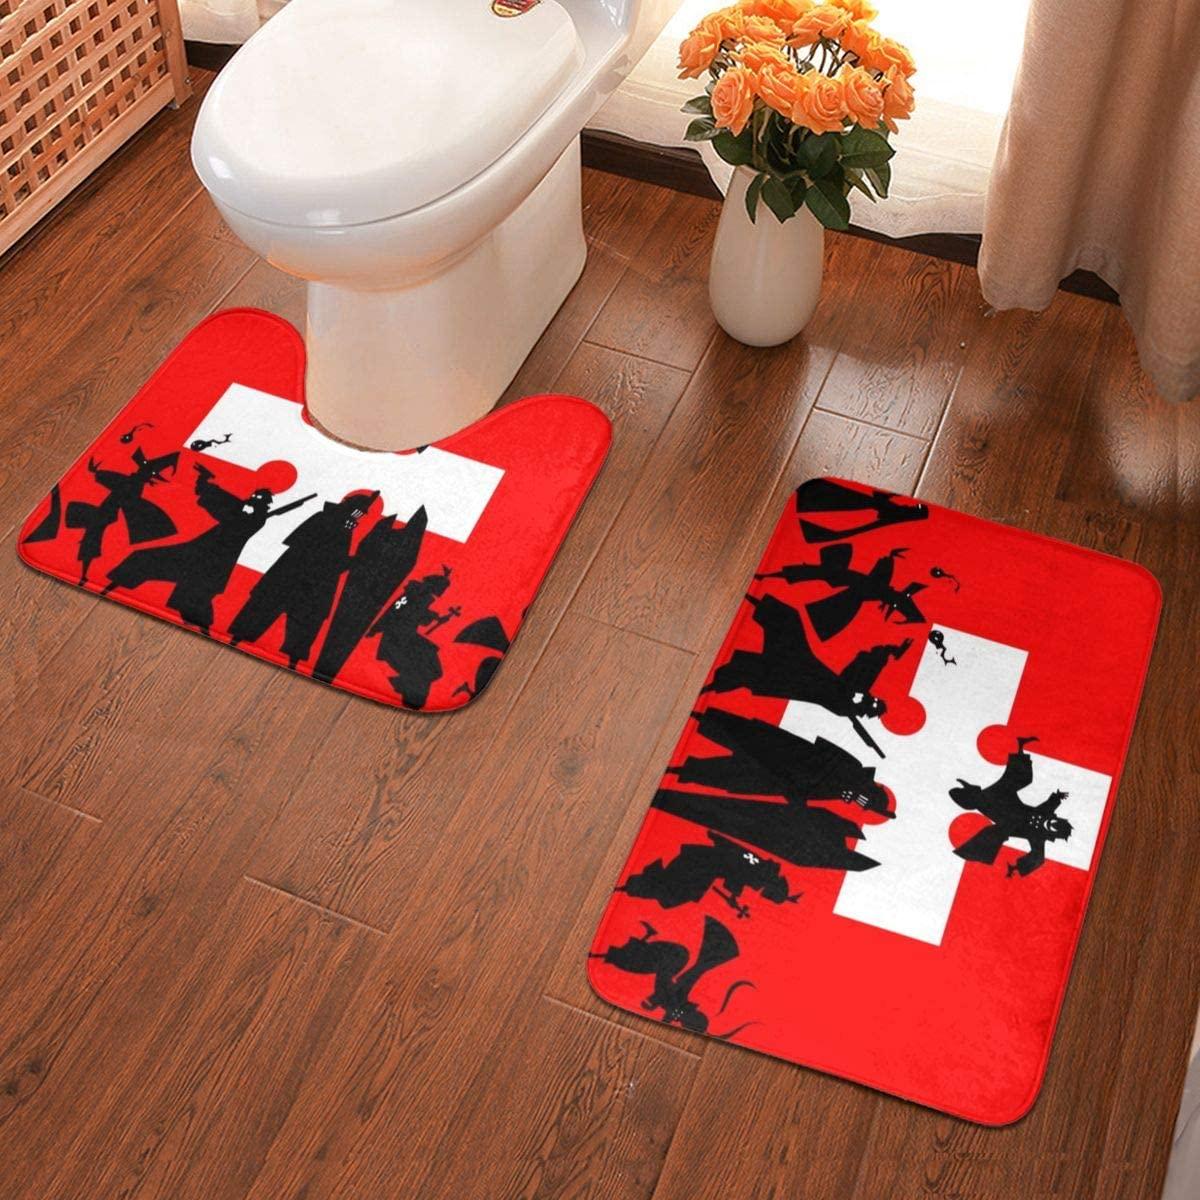 SKGQZD Fire Force Bath Mats 3 Piece Set Bathroom Carpet Set Soft Anti-Skid Bath Rug Mat - U Contour Pads - Absorbent Carpet Bath and Mat for Decorations Bathroom